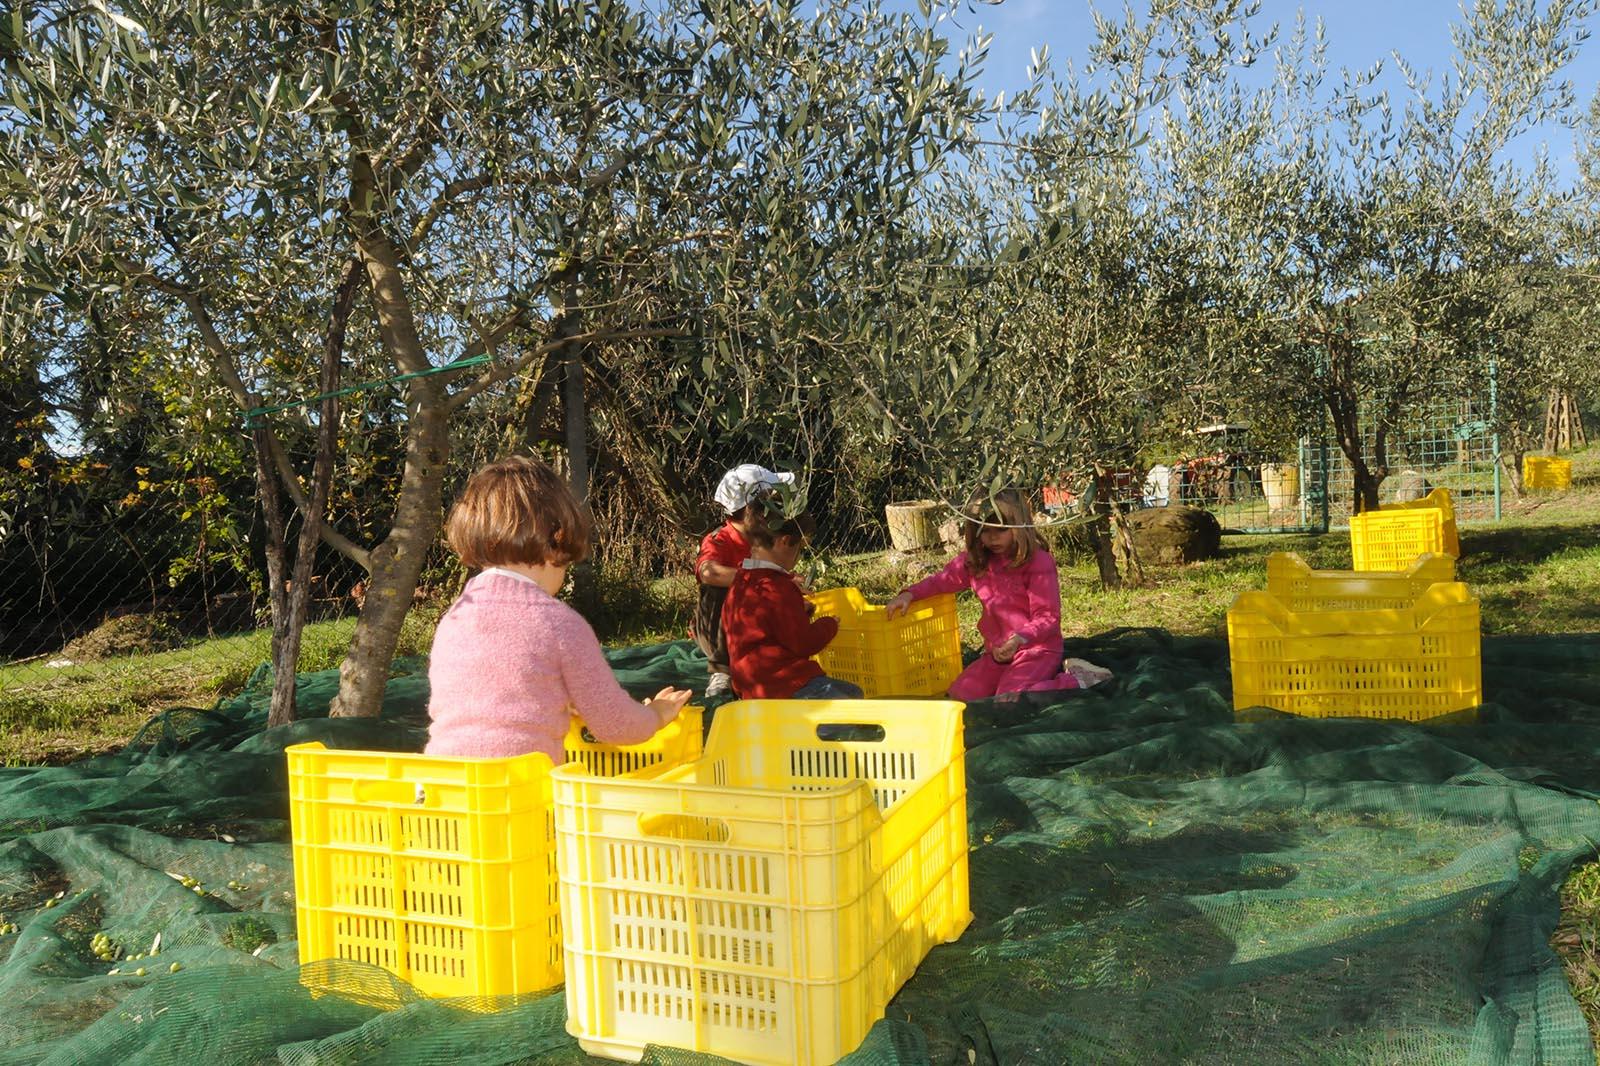 Frantoi aperti in Umbria, raccolta delle olive